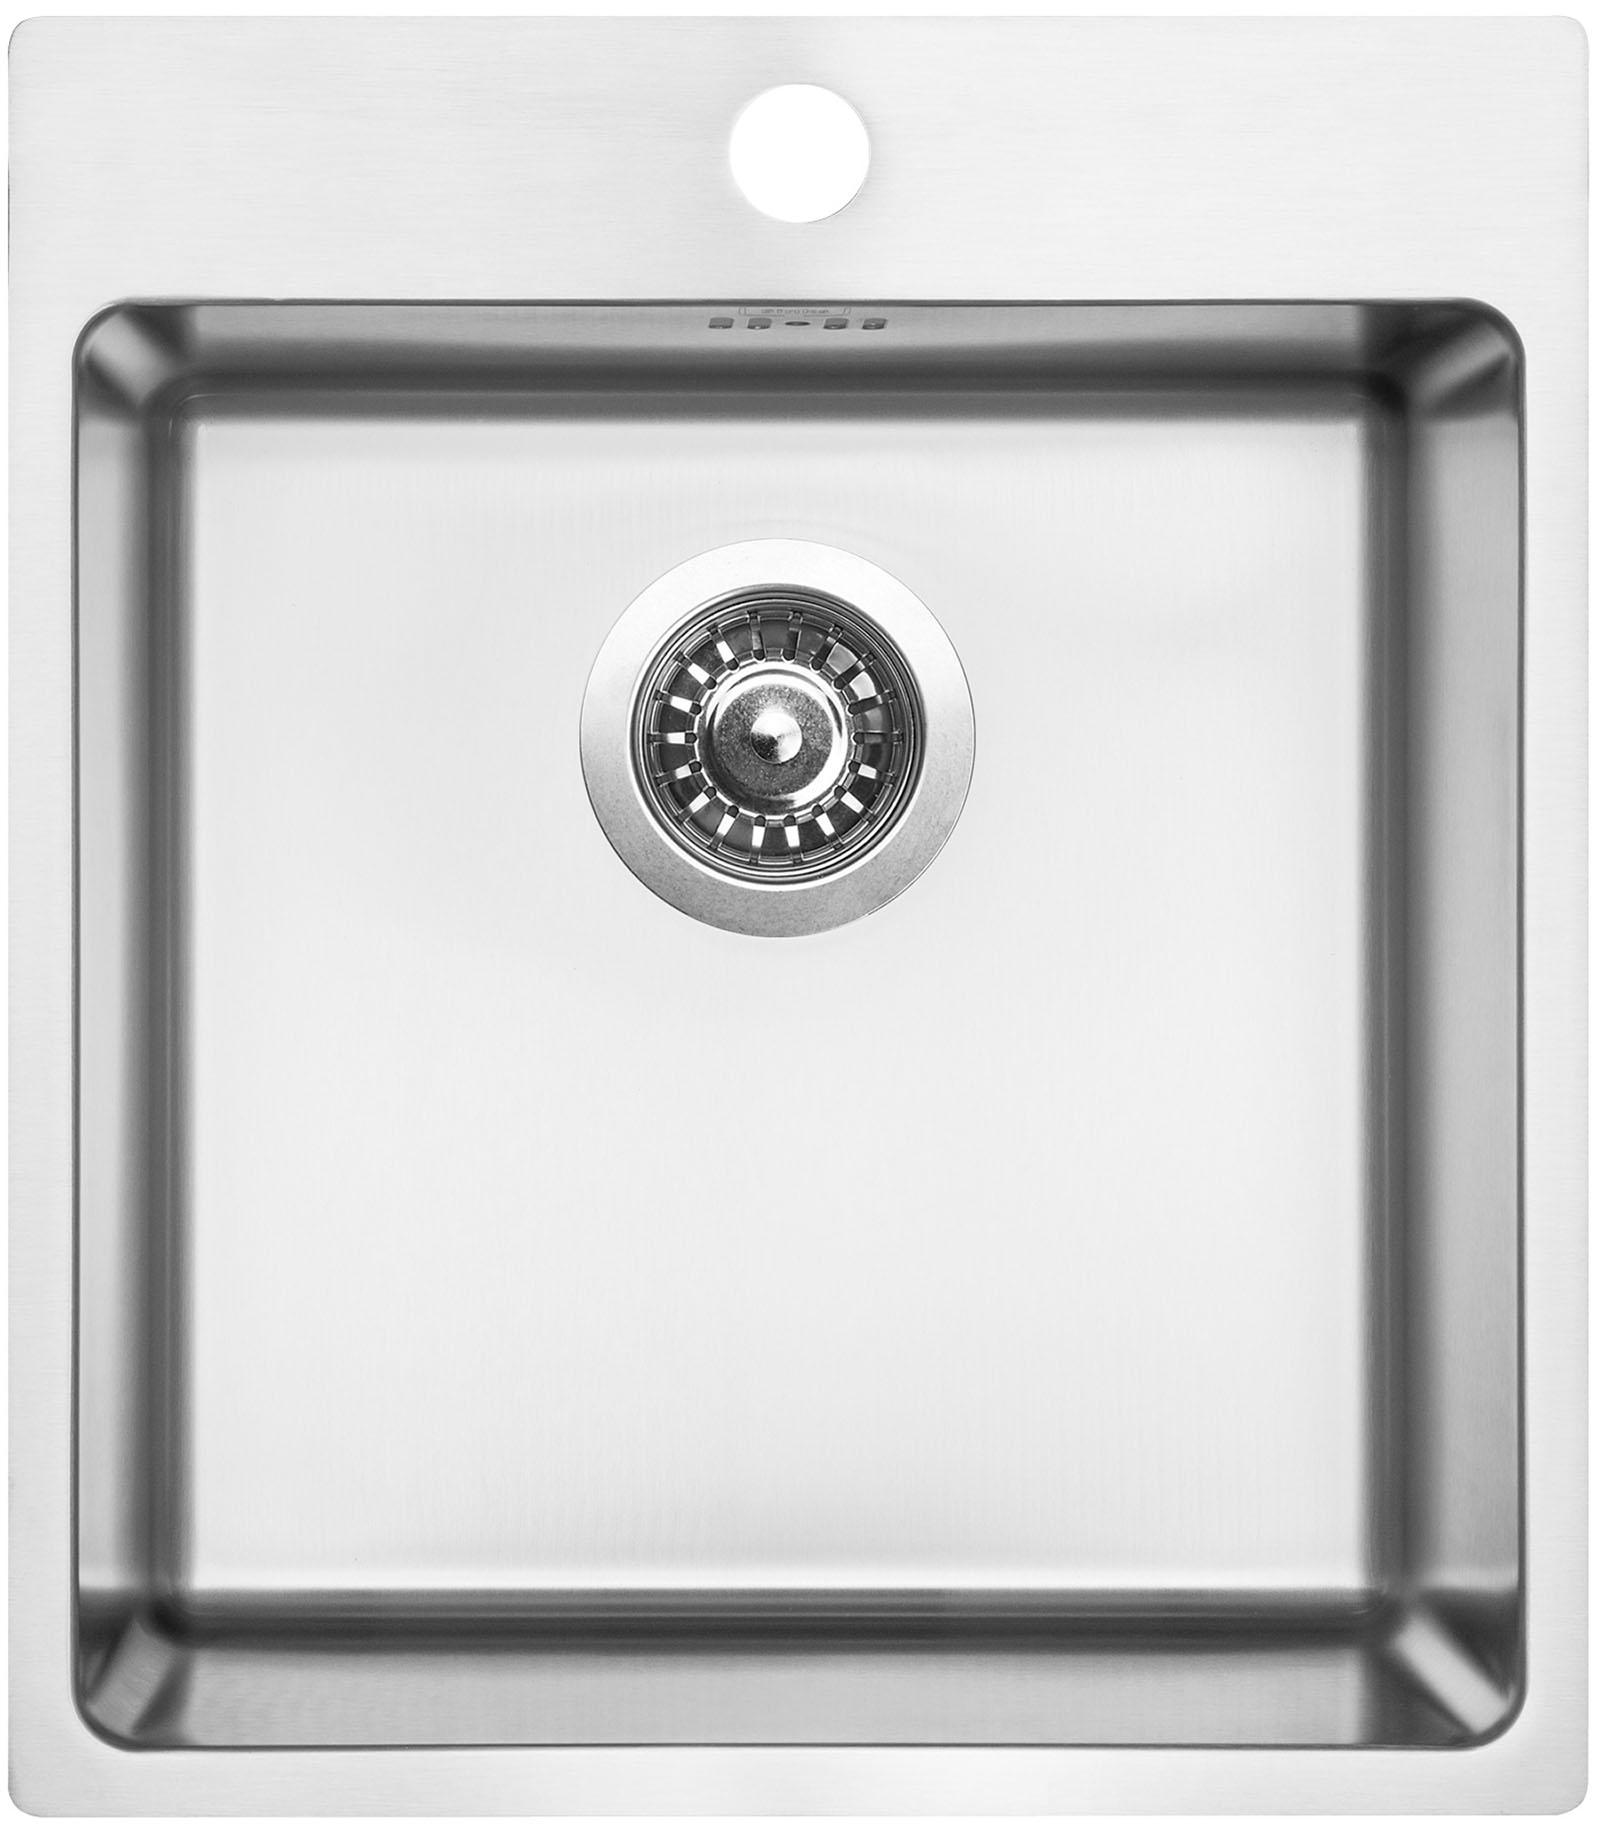 Sinks BLOCKER 440 V 1mm kartáčovaný